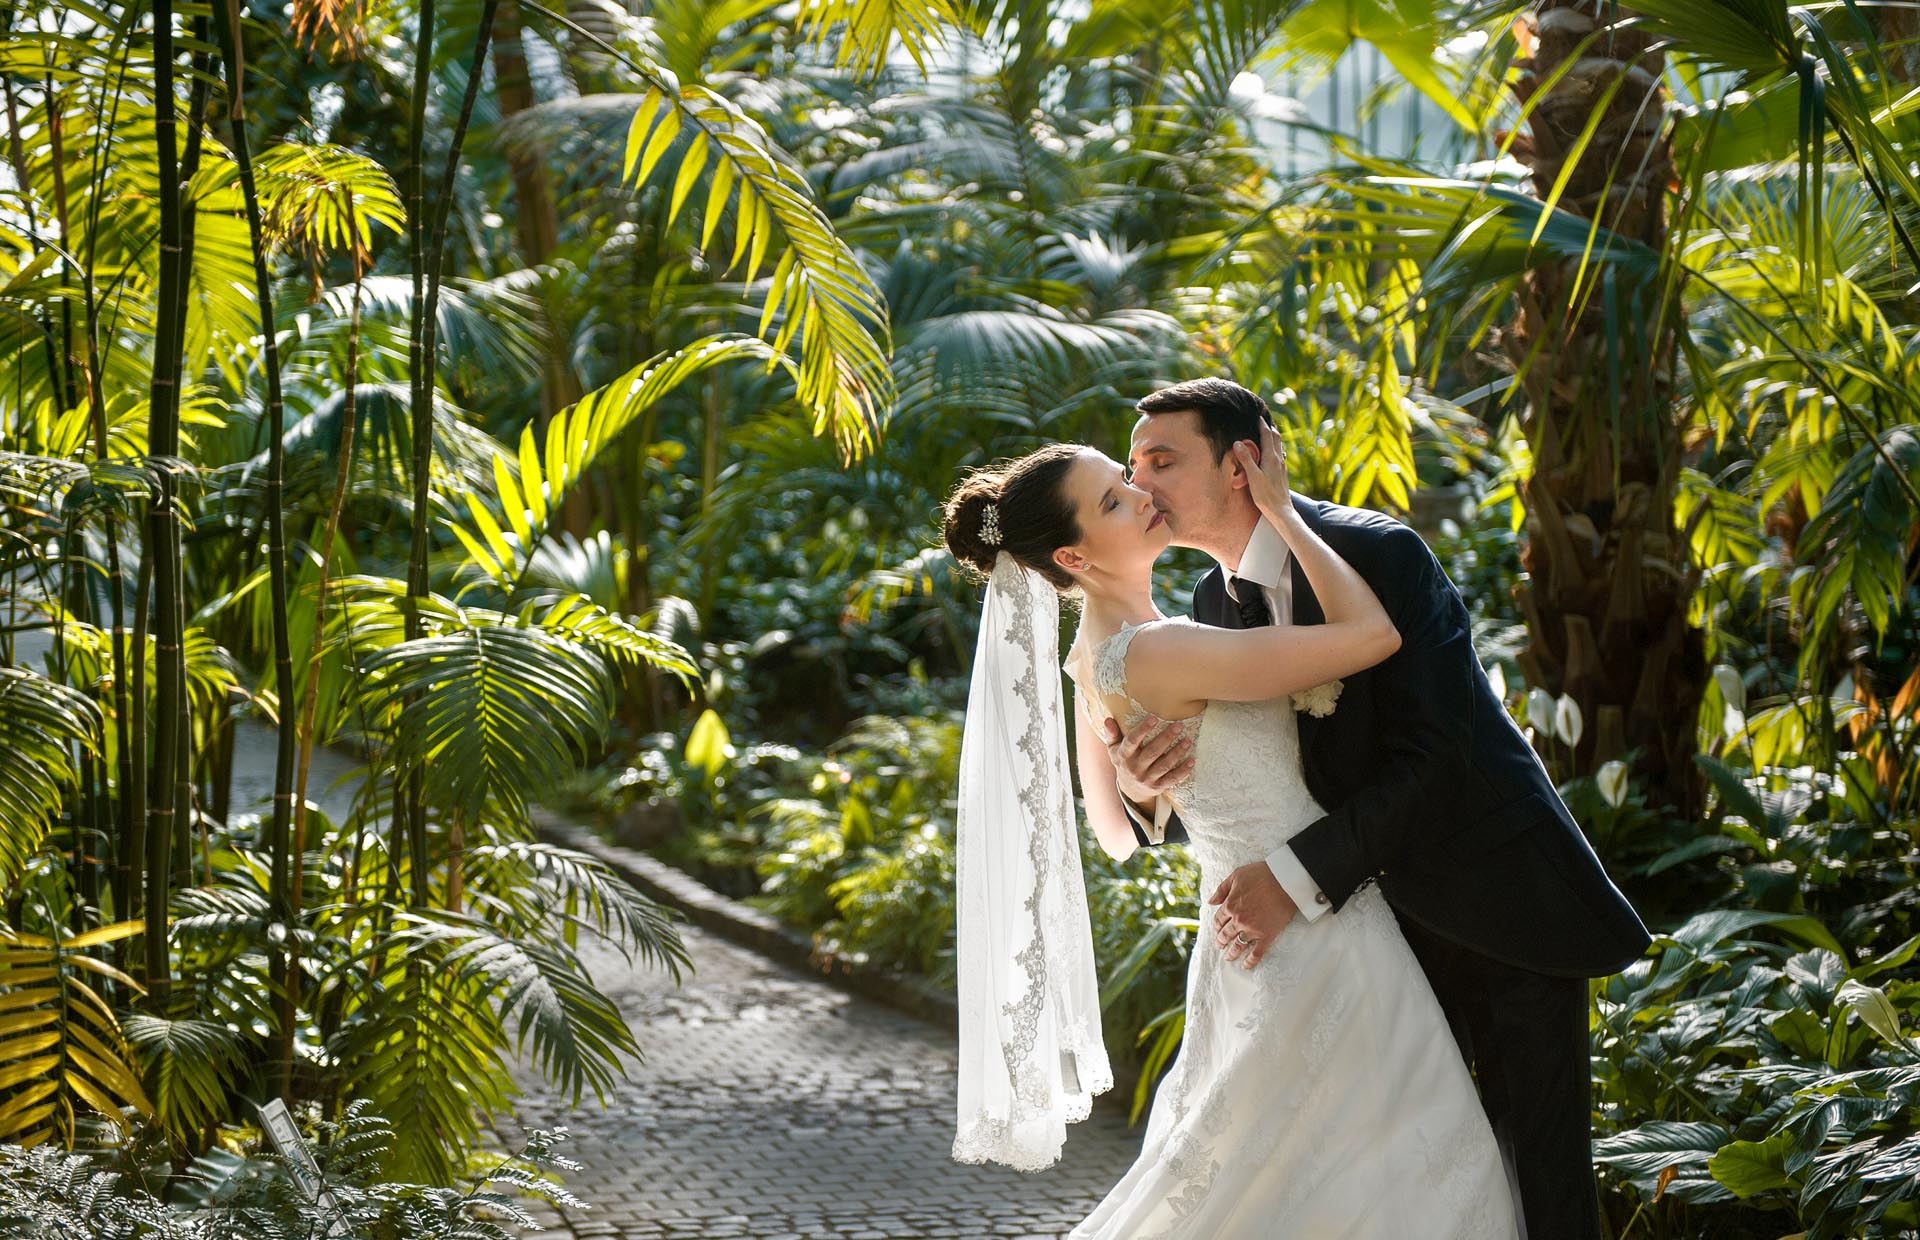 After Wedding Shooting im Botanischen Garten, Palmengarten Frankfurt